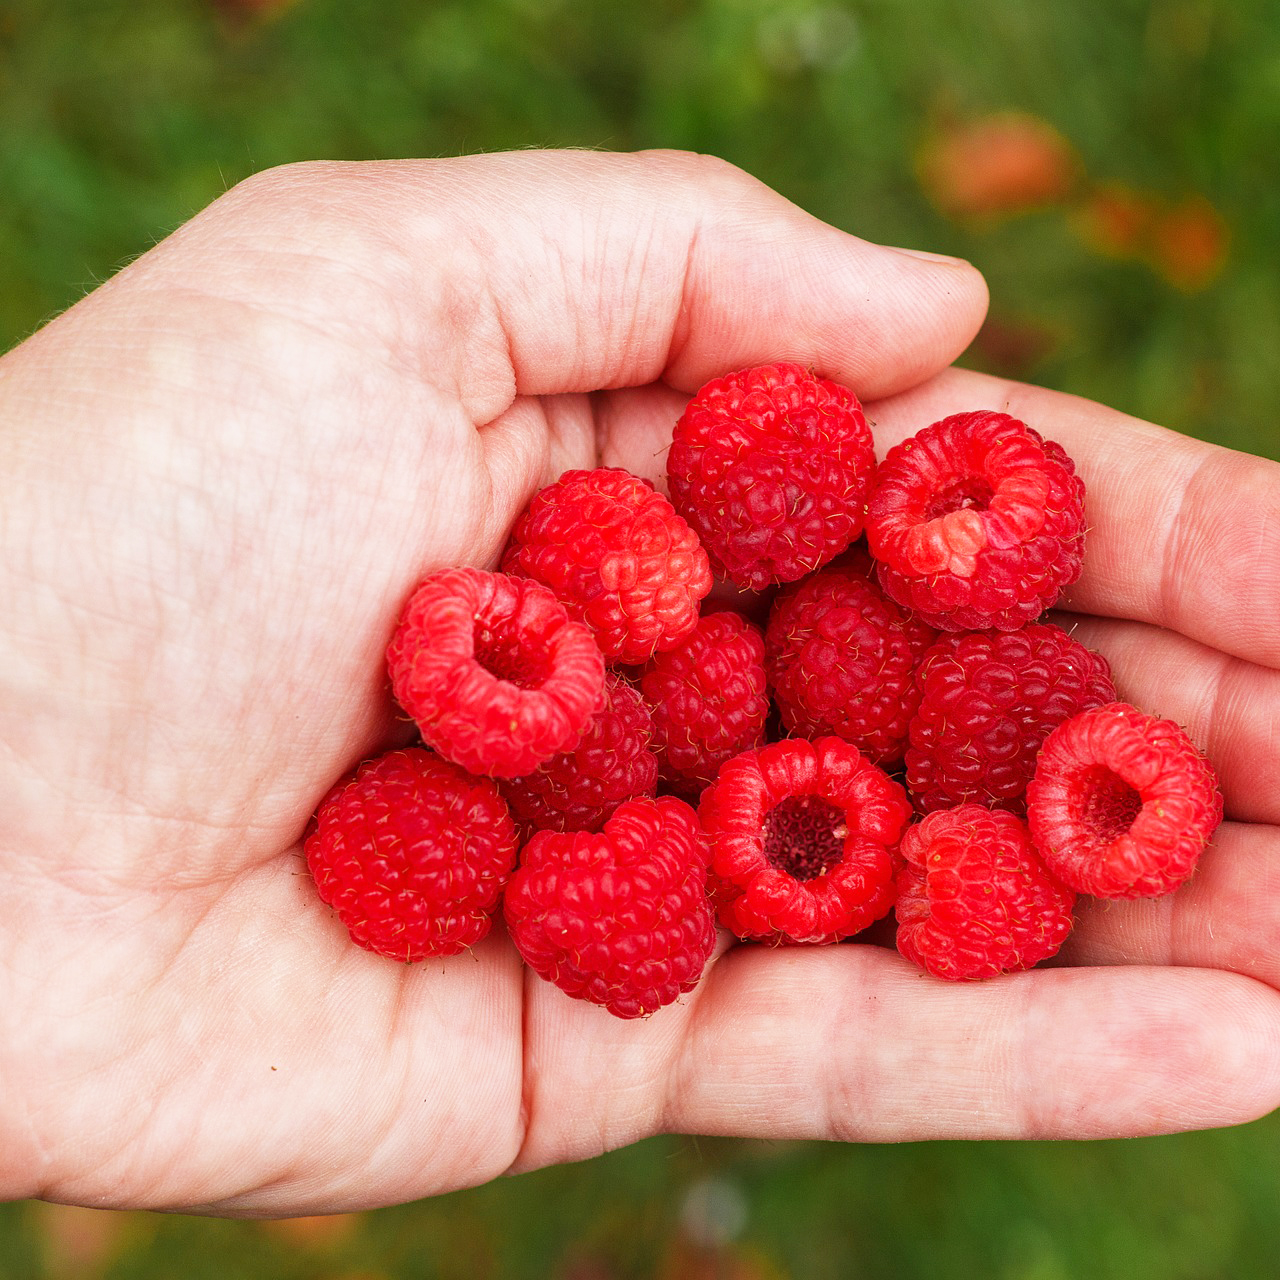 Nova Summer Red Raspberry Bushes